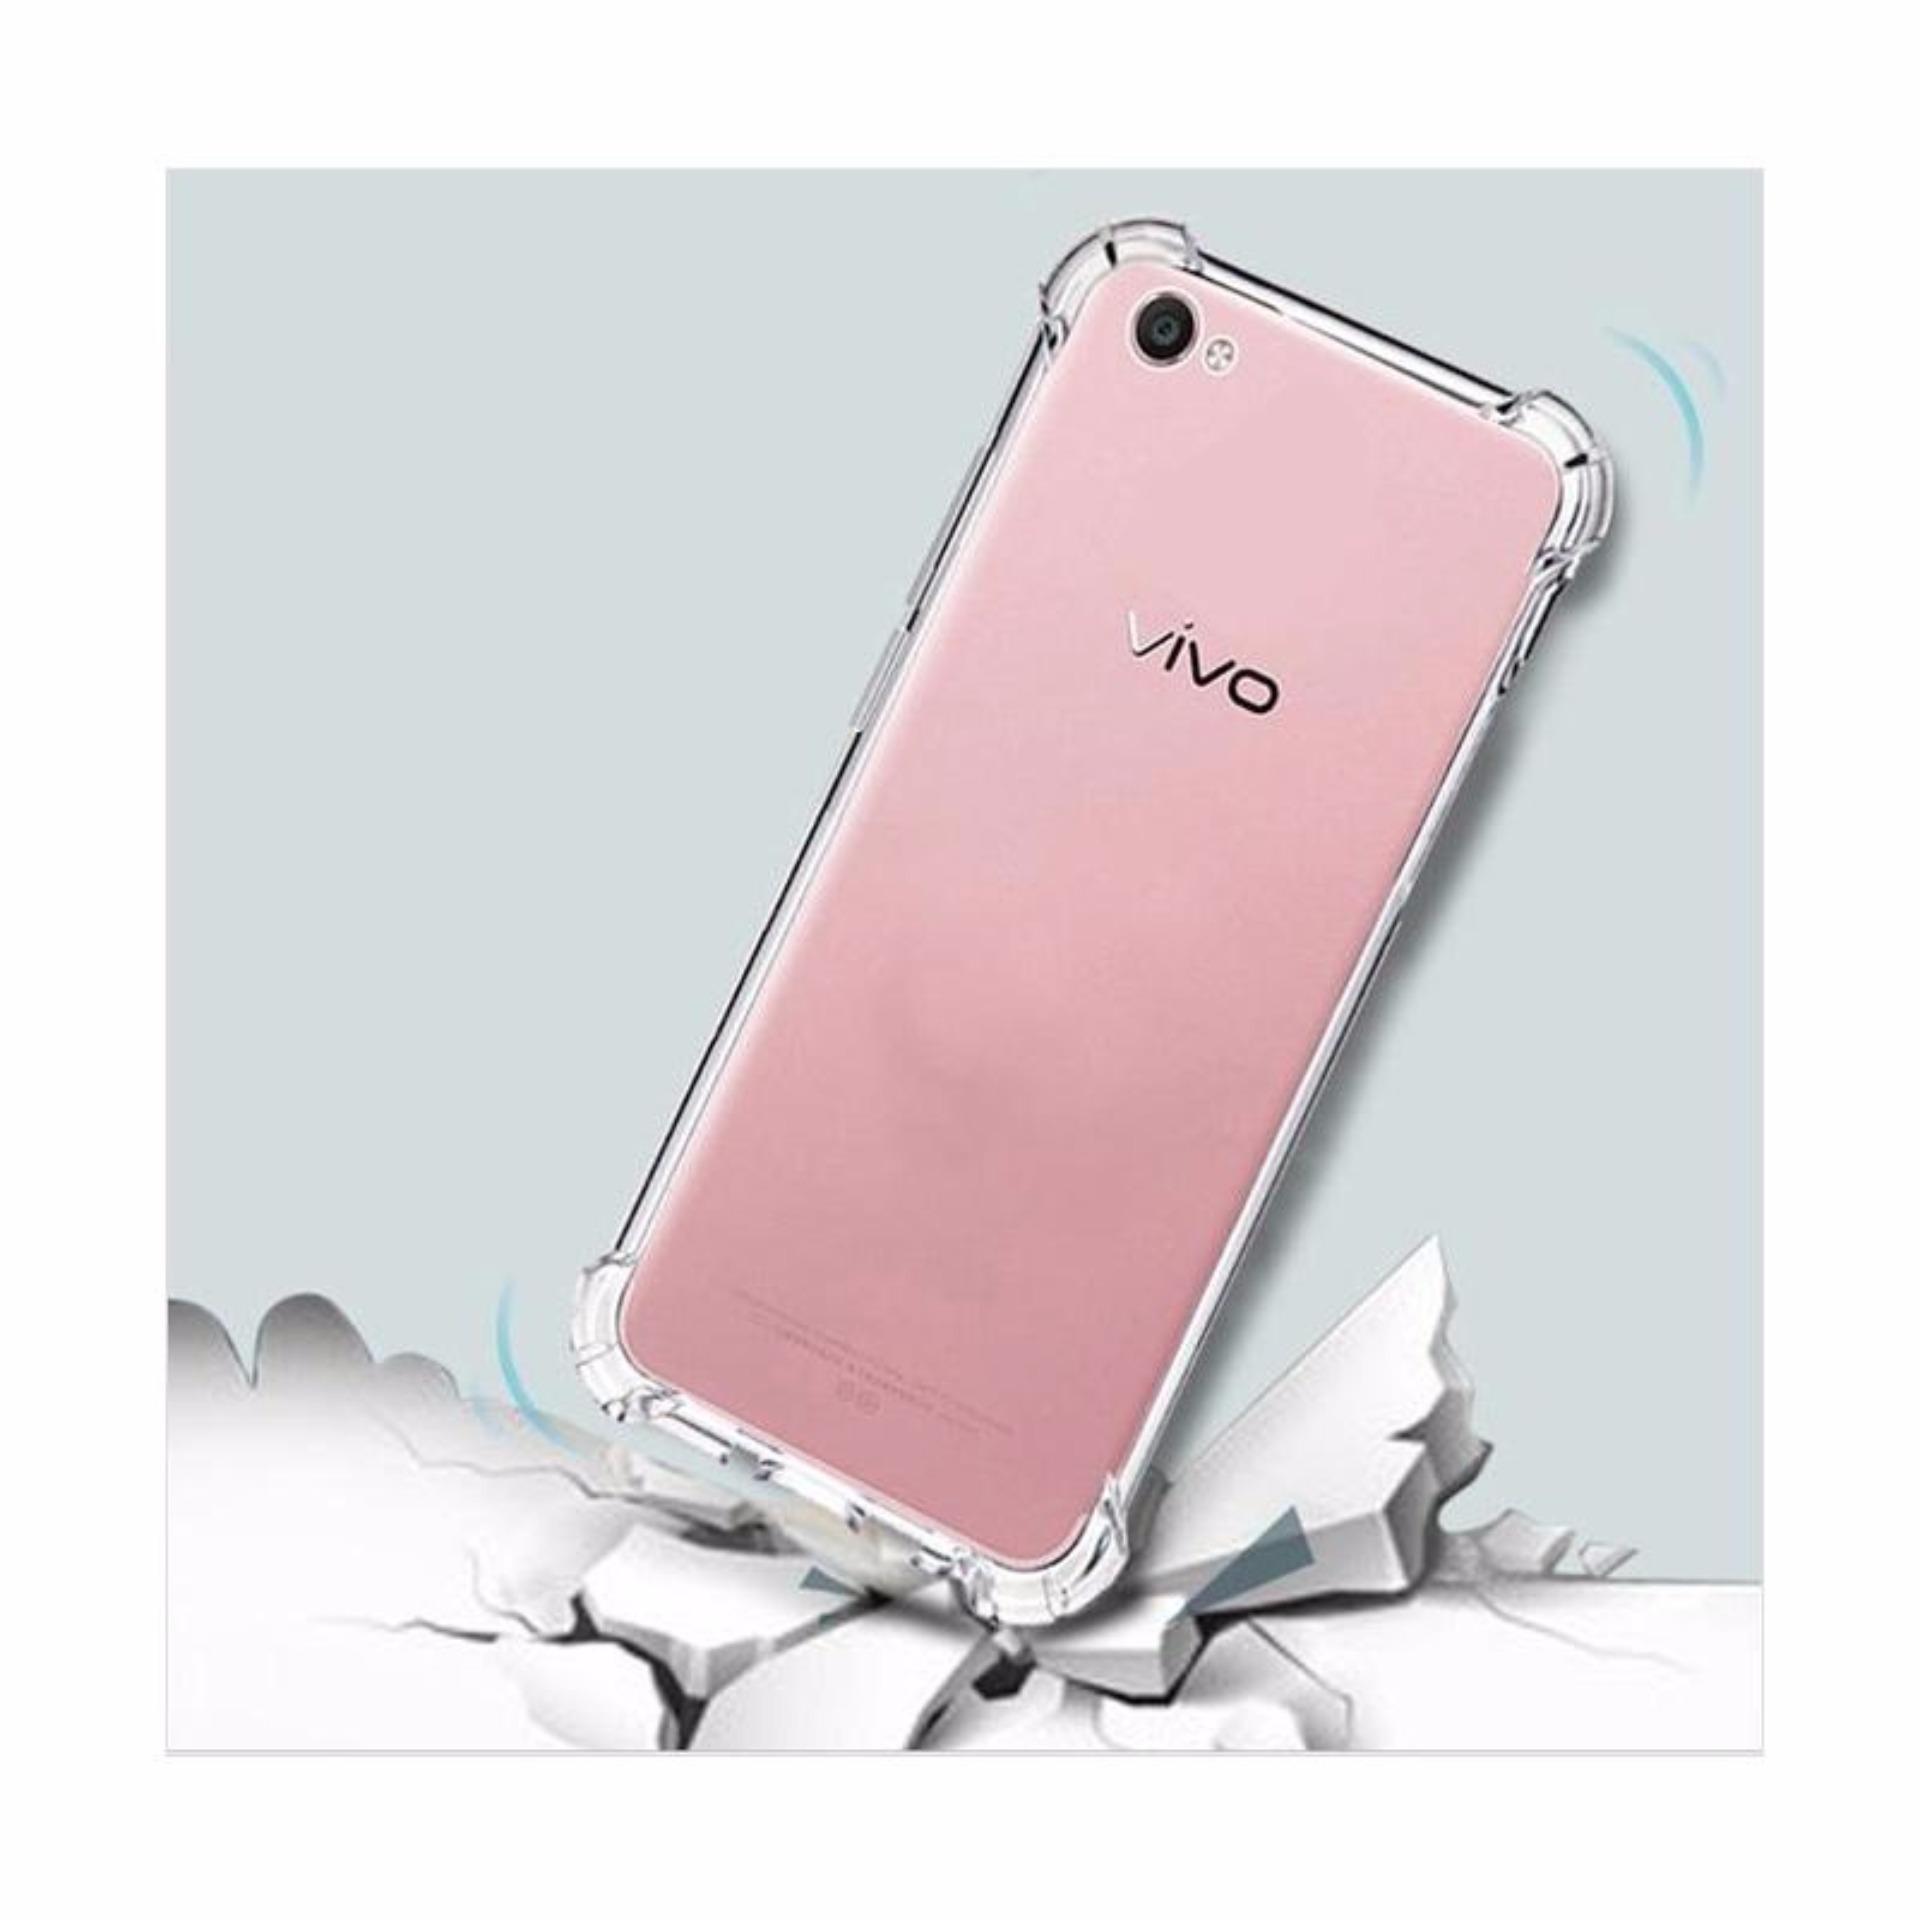 Bandingkan Toko Softcase Anti Jamur Crack Vivo Y53 Air Case 03 Tali Sepatu Silicon Silikon 03mm Silicone Soft